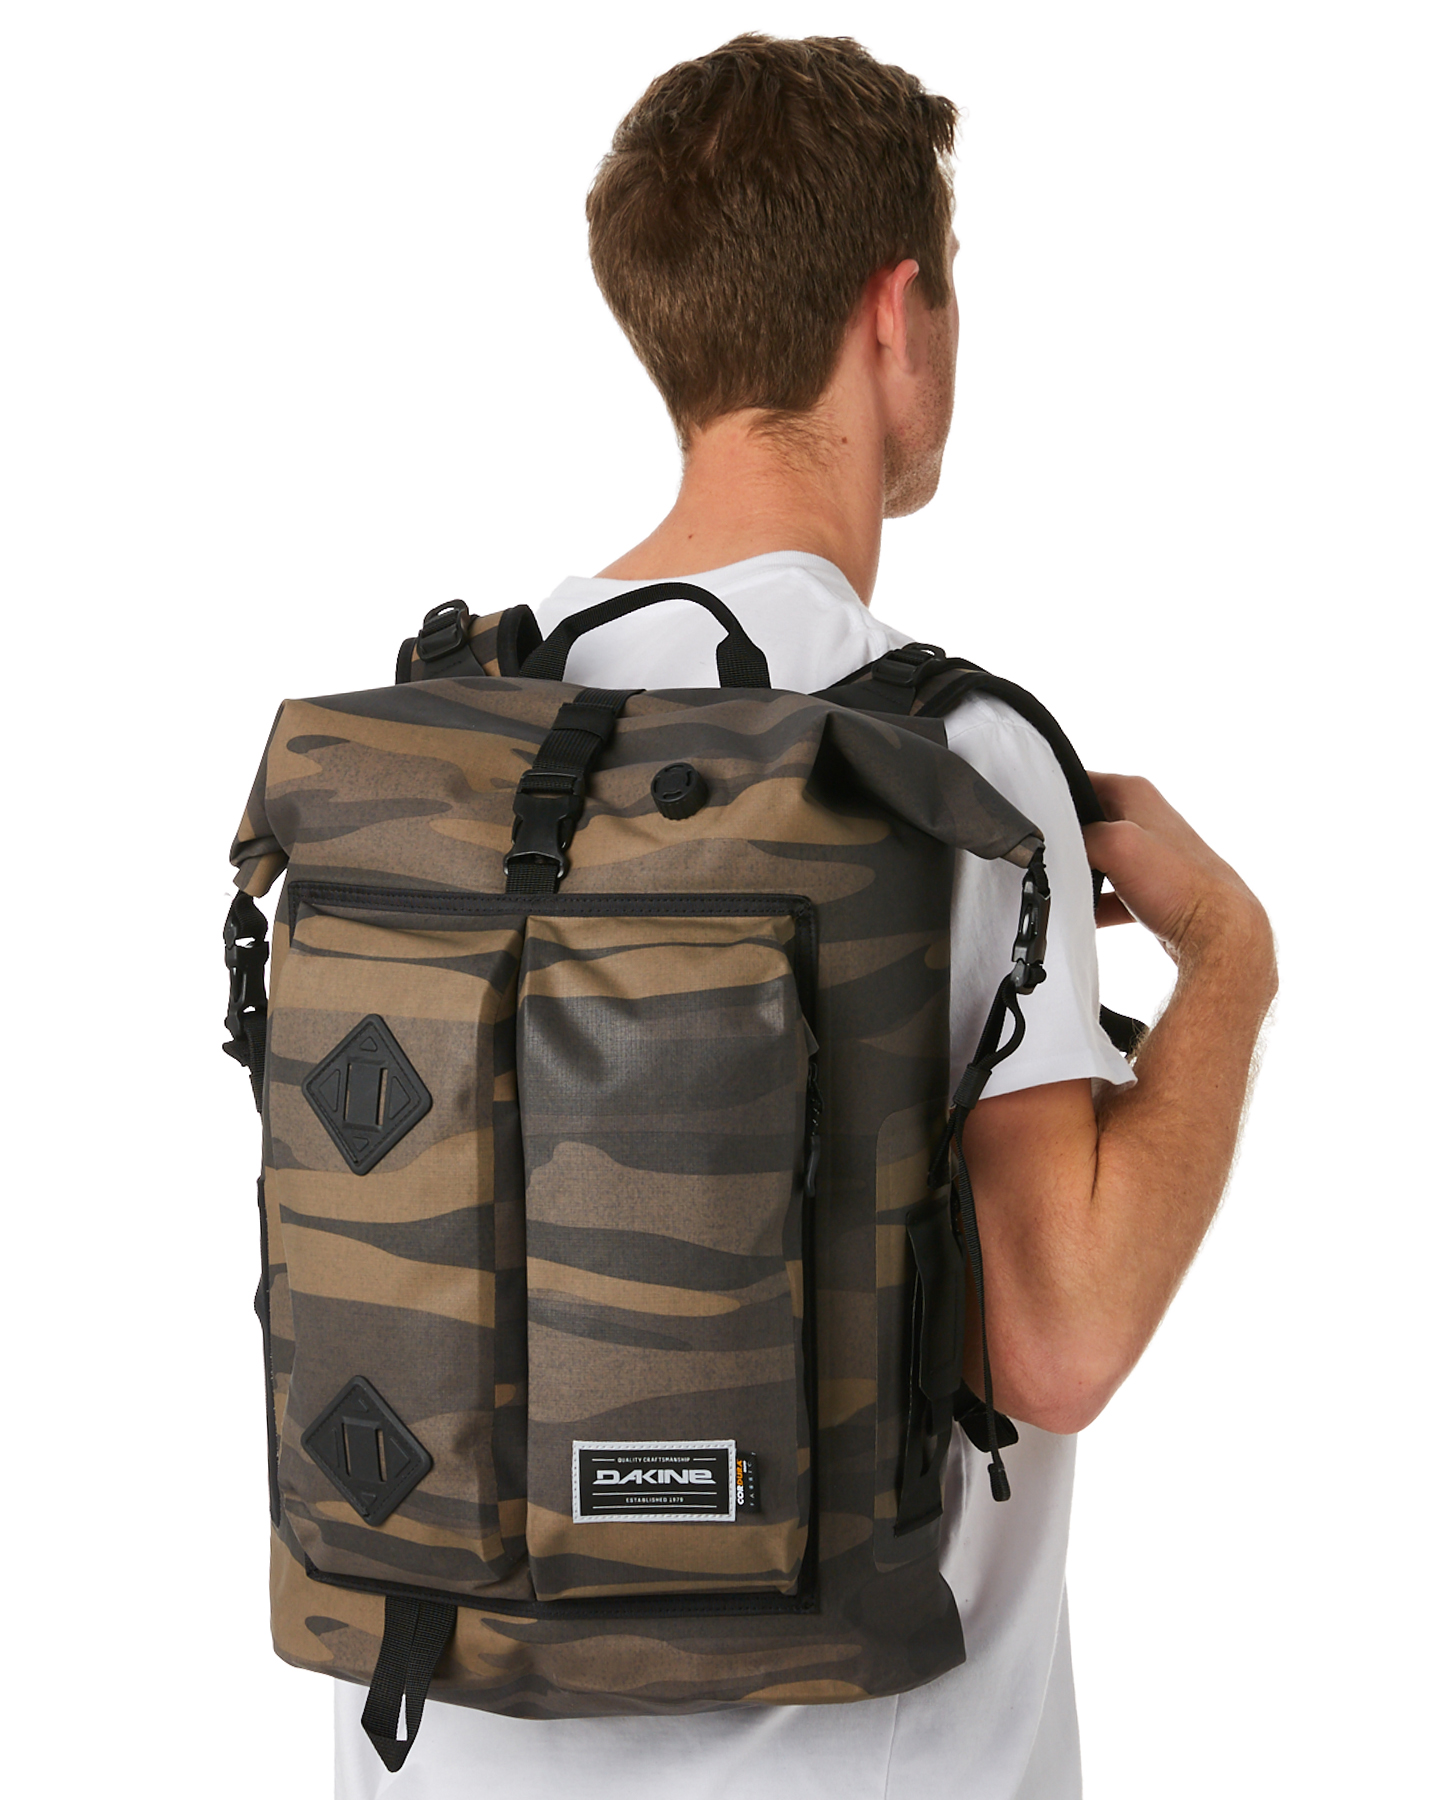 New Dakine Men s Cyclone Ii Dry 36L Waterproof Backpack Mesh Green ... 0800fd79e84b8